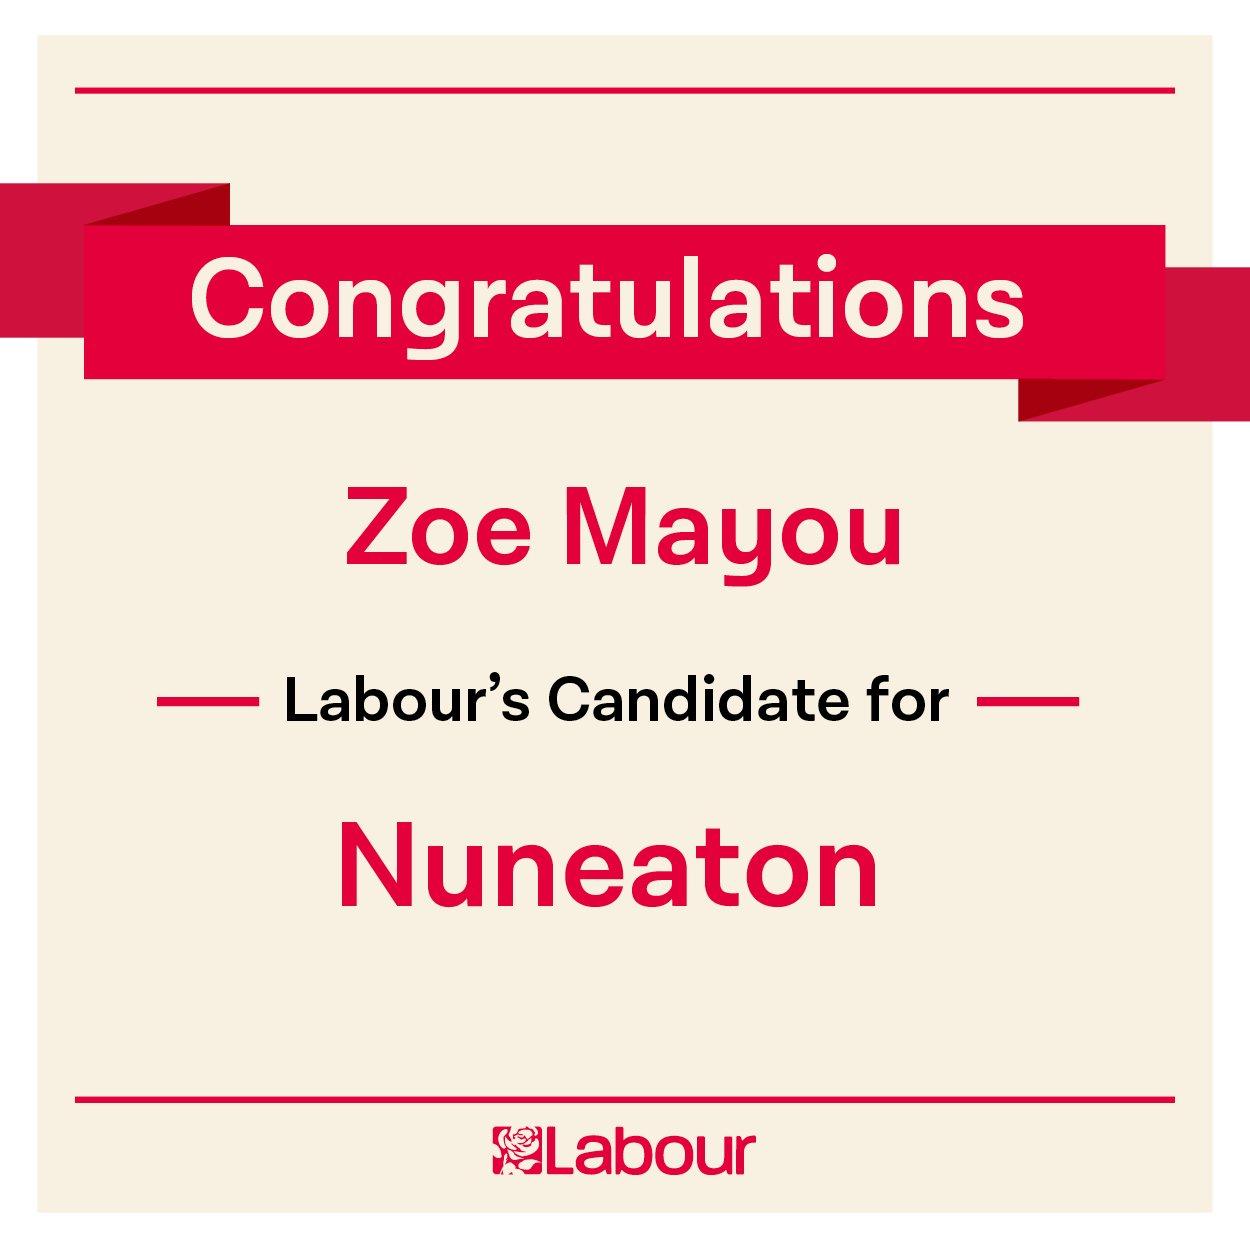 Congratulations Zoe Mayou (@zoe_mayou), Labour's candidate for Nuneaton! https://t.co/erk8Jmif1K